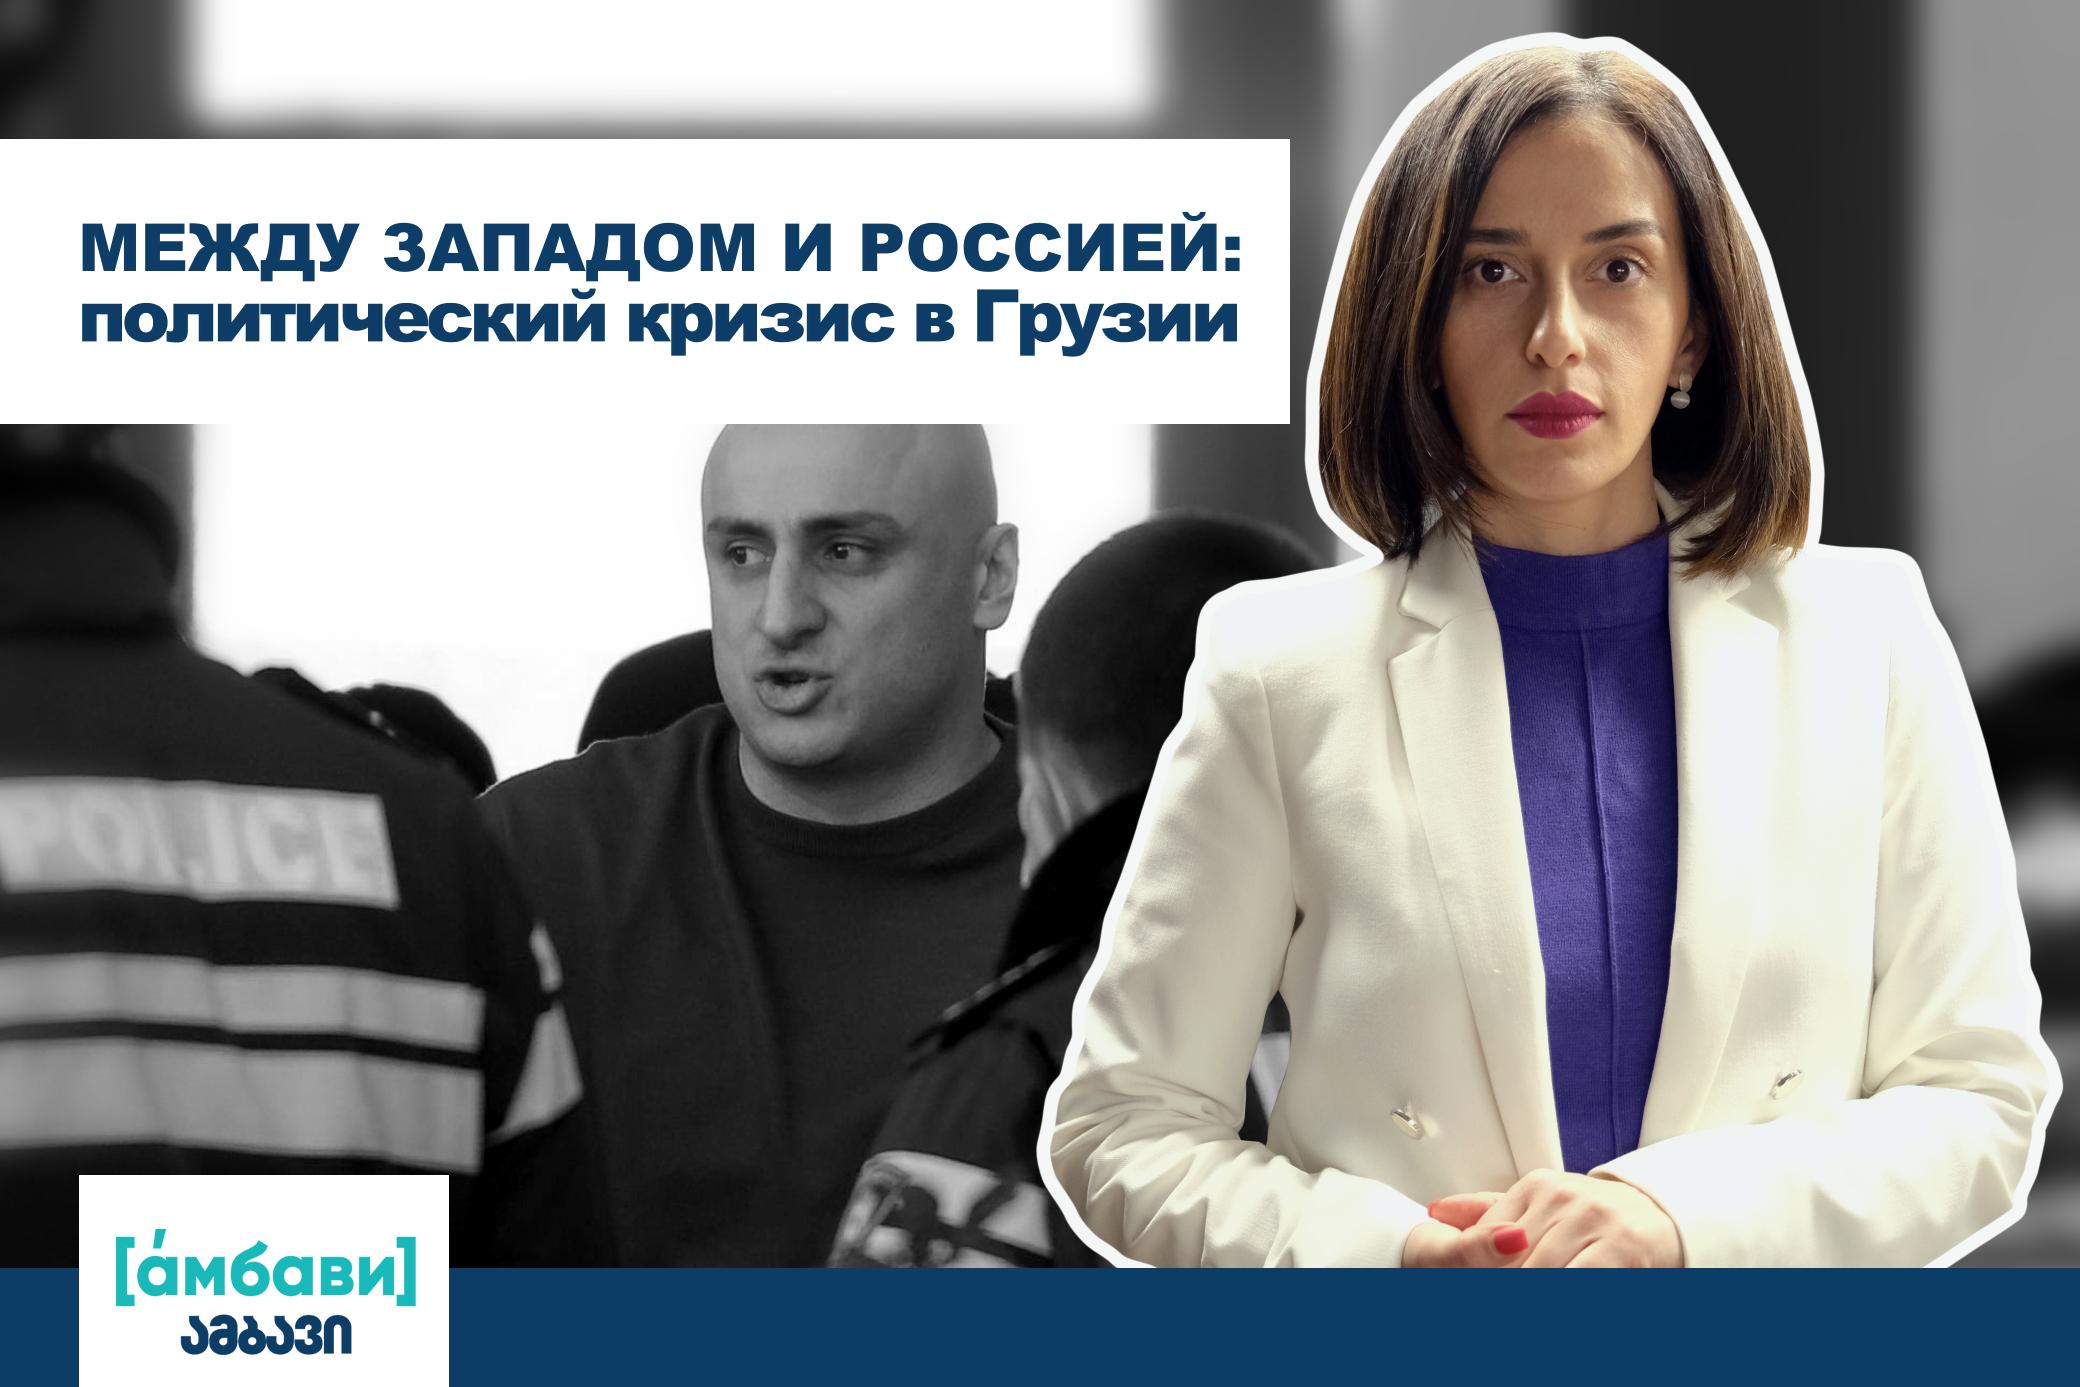 AMBAVI BANNER 0 00 00 00 Торнике Шарашенидзе Торнике Шарашенидзе